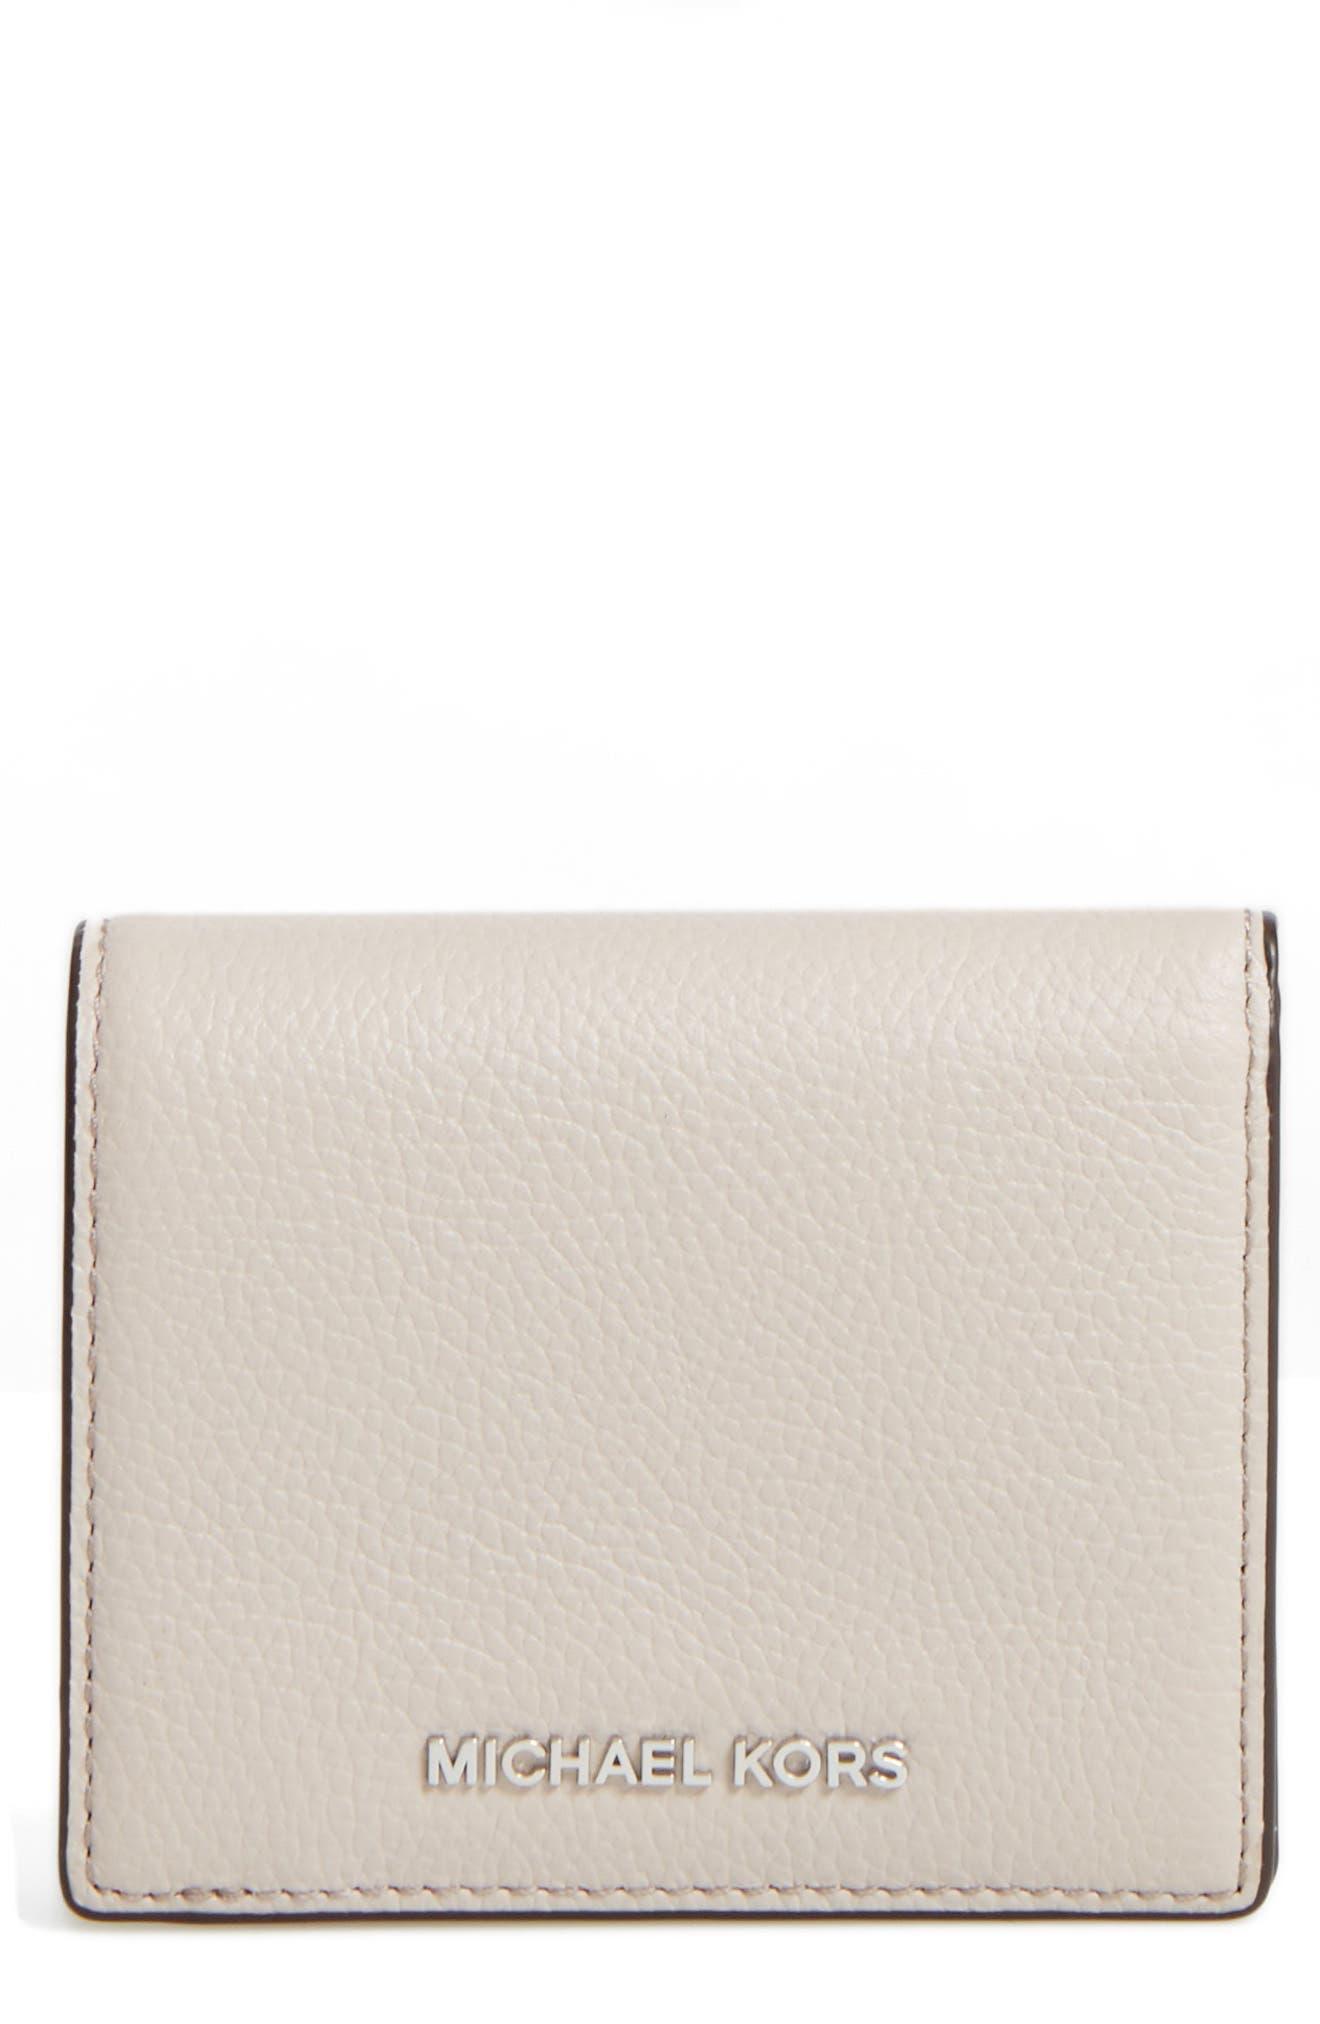 Mercer Leather RFID Cardholder Wallet,                         Main,                         color, Cement